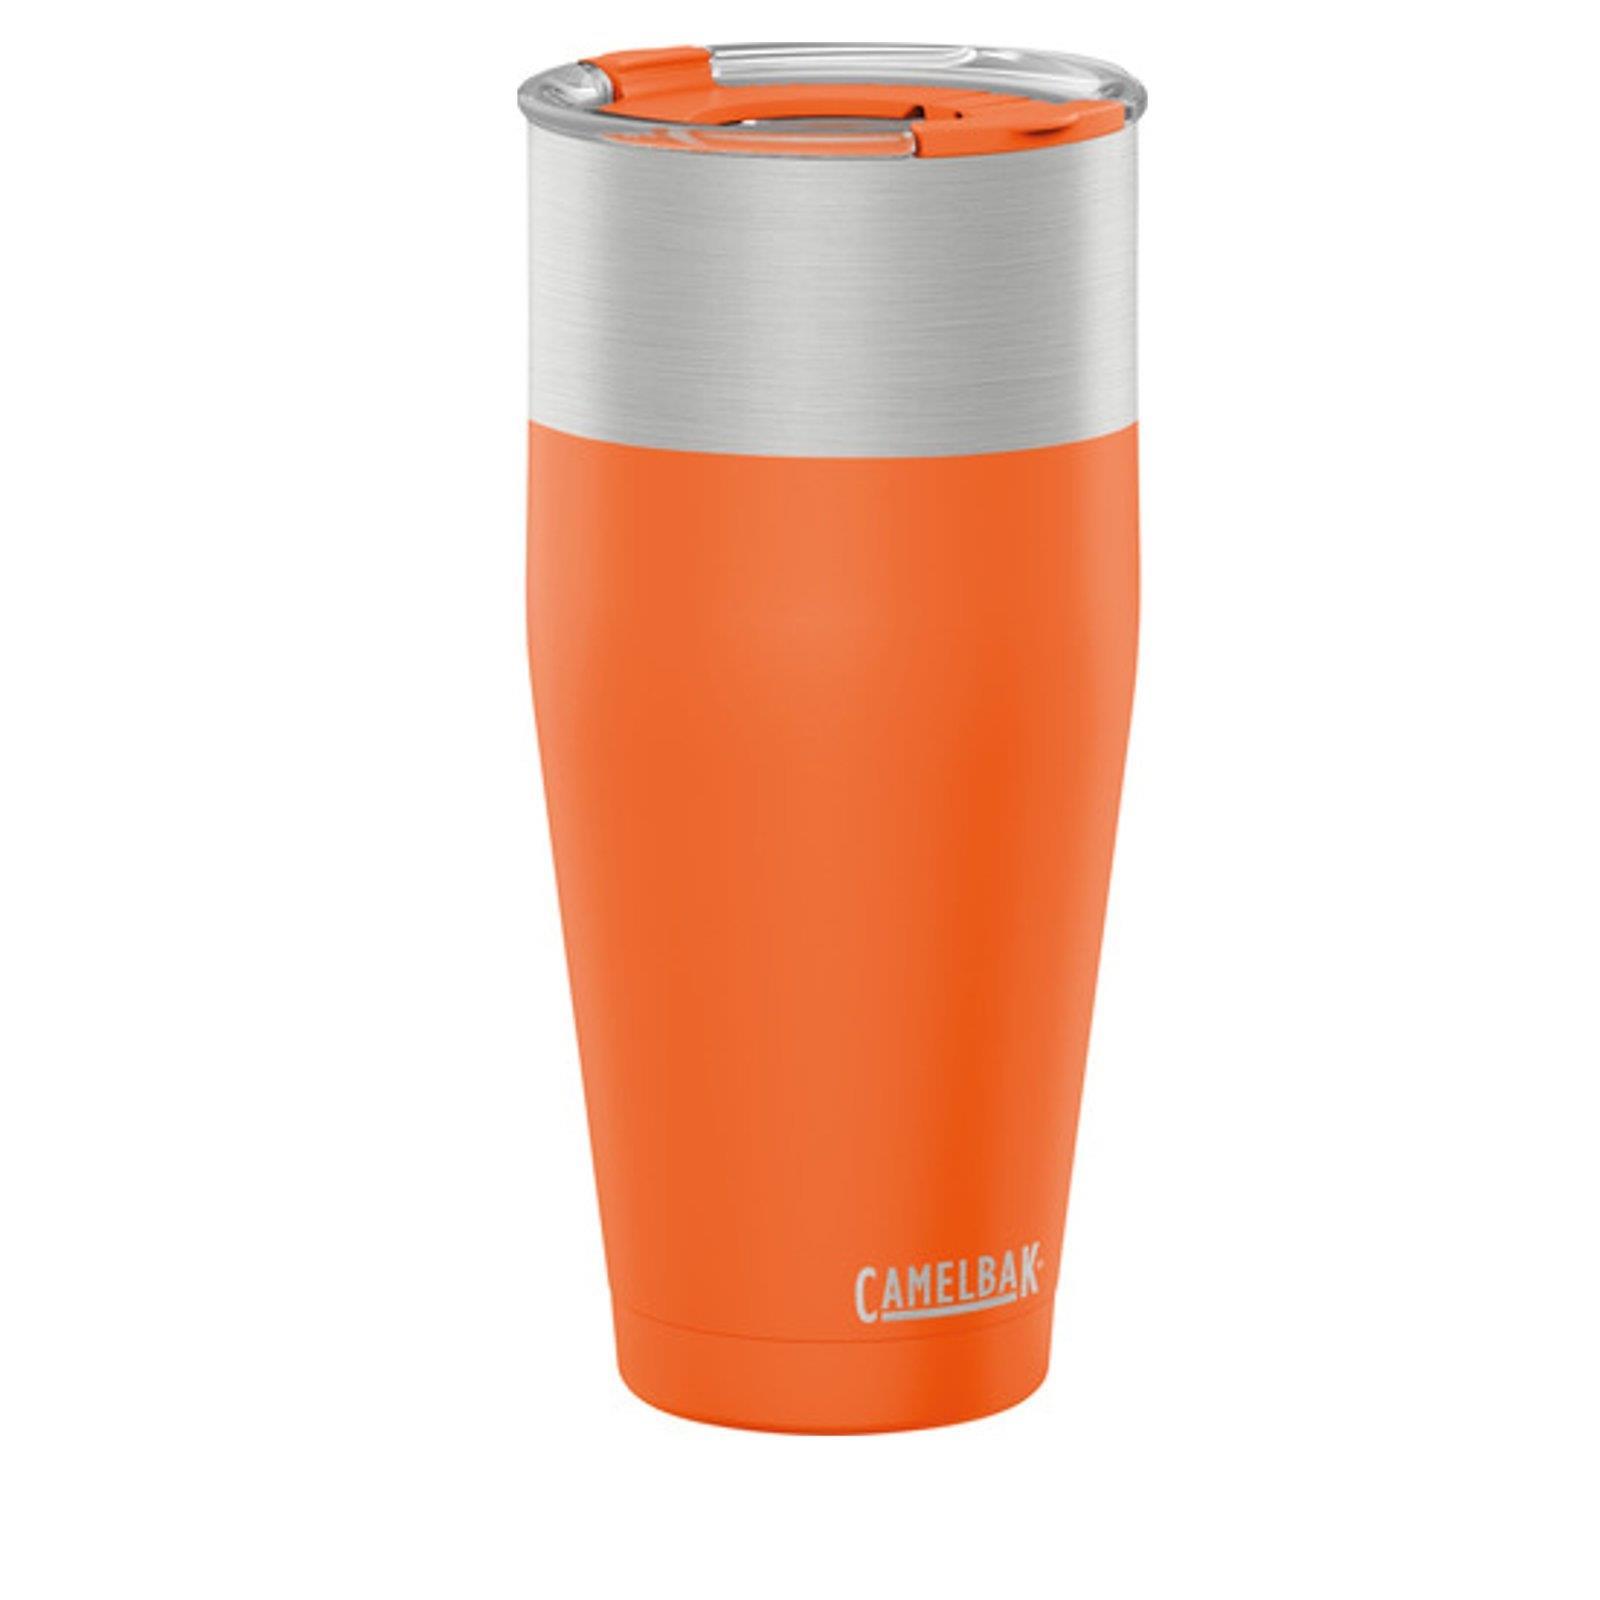 Camelbak-Kickbak-Edelstahl-Thermo-Trink-Auto-Becher-600ml-900ml-Isoliert-Kaffee Indexbild 7